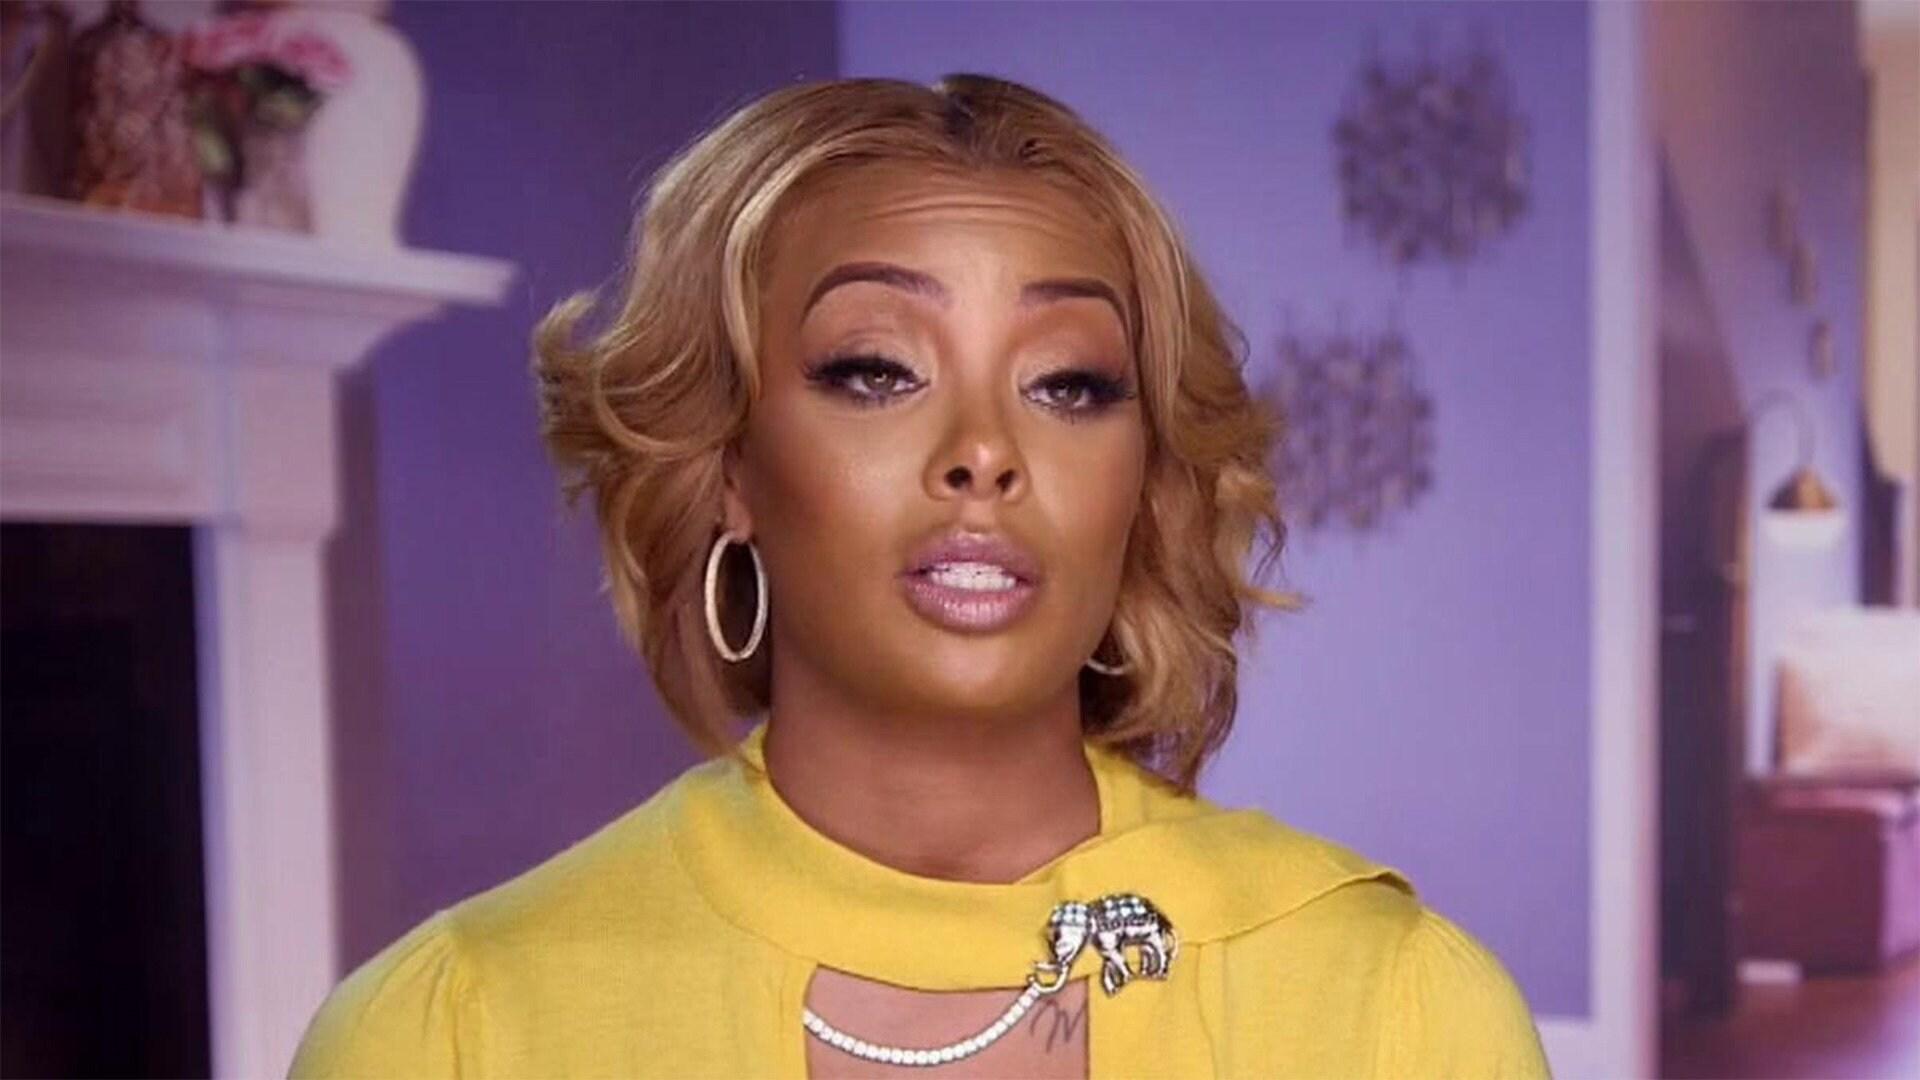 The Model Bride